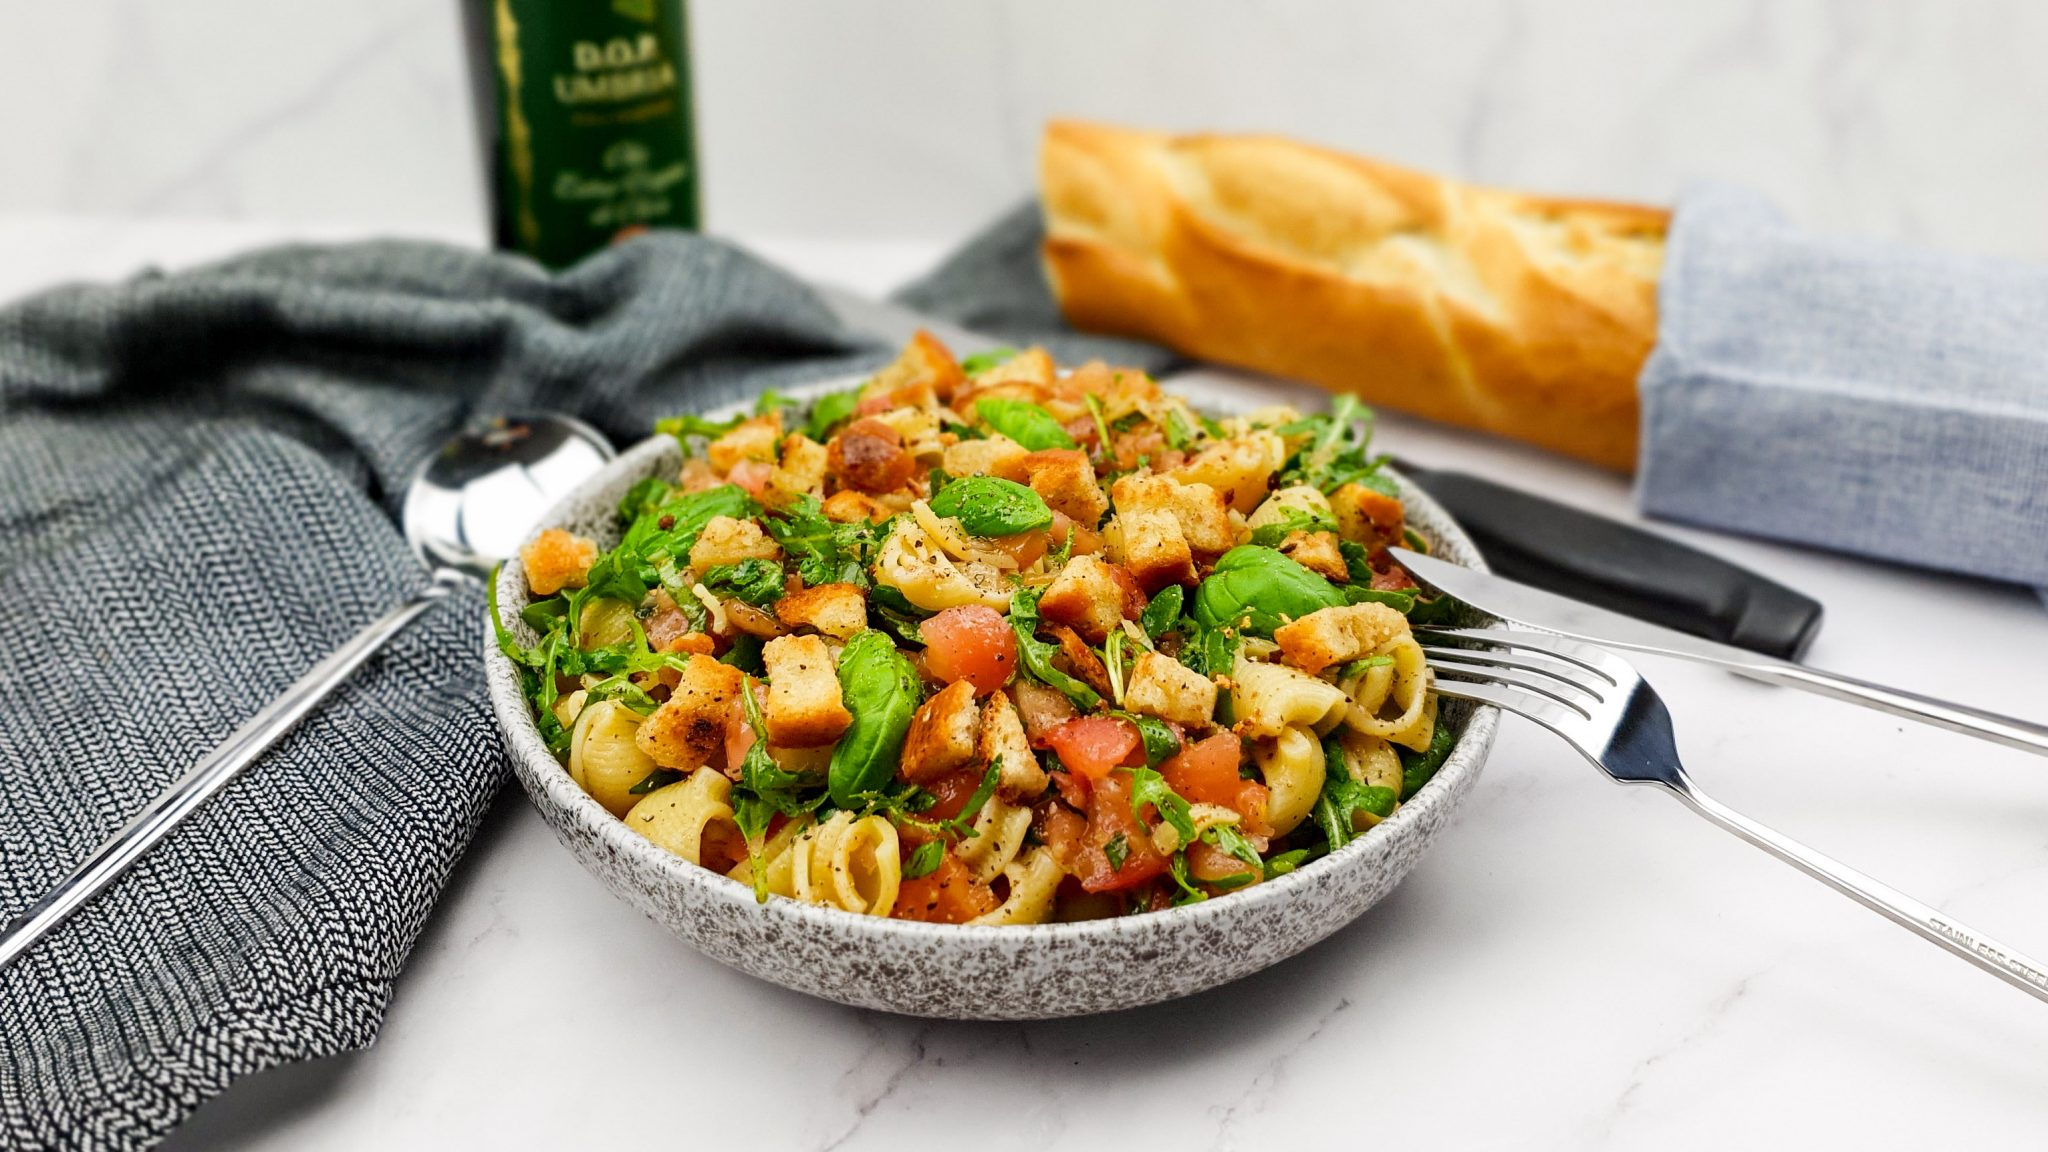 Bruschetta pastasalade